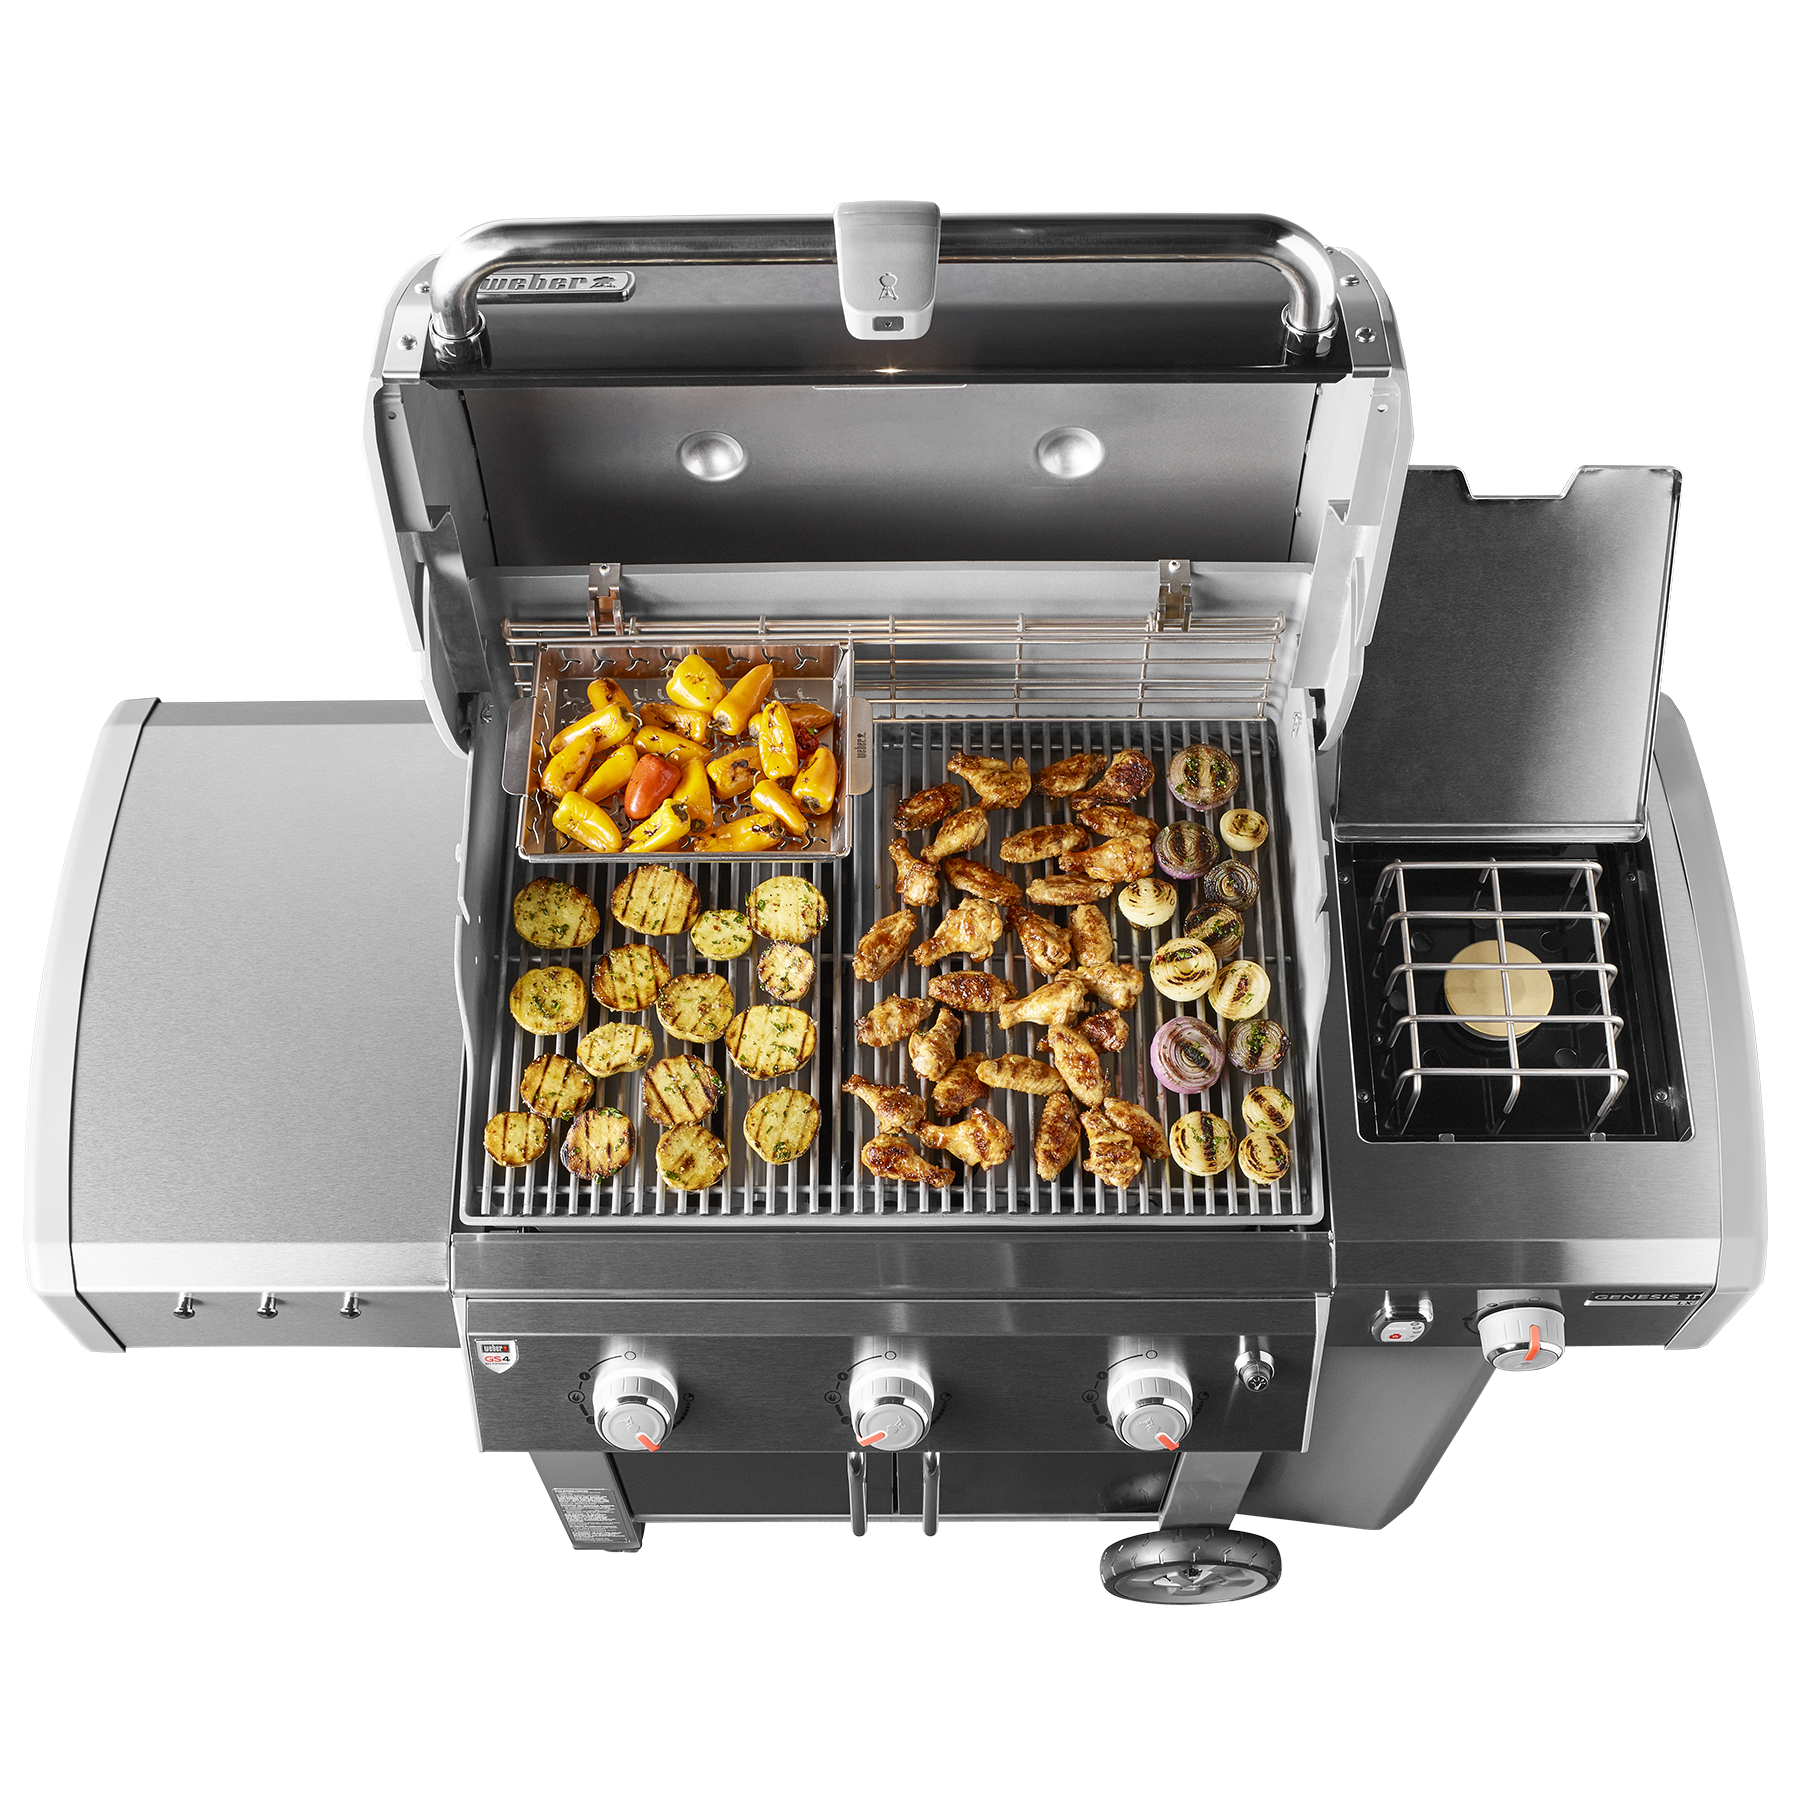 Barbacoa de gas Genesis® II LX E-340 GBS